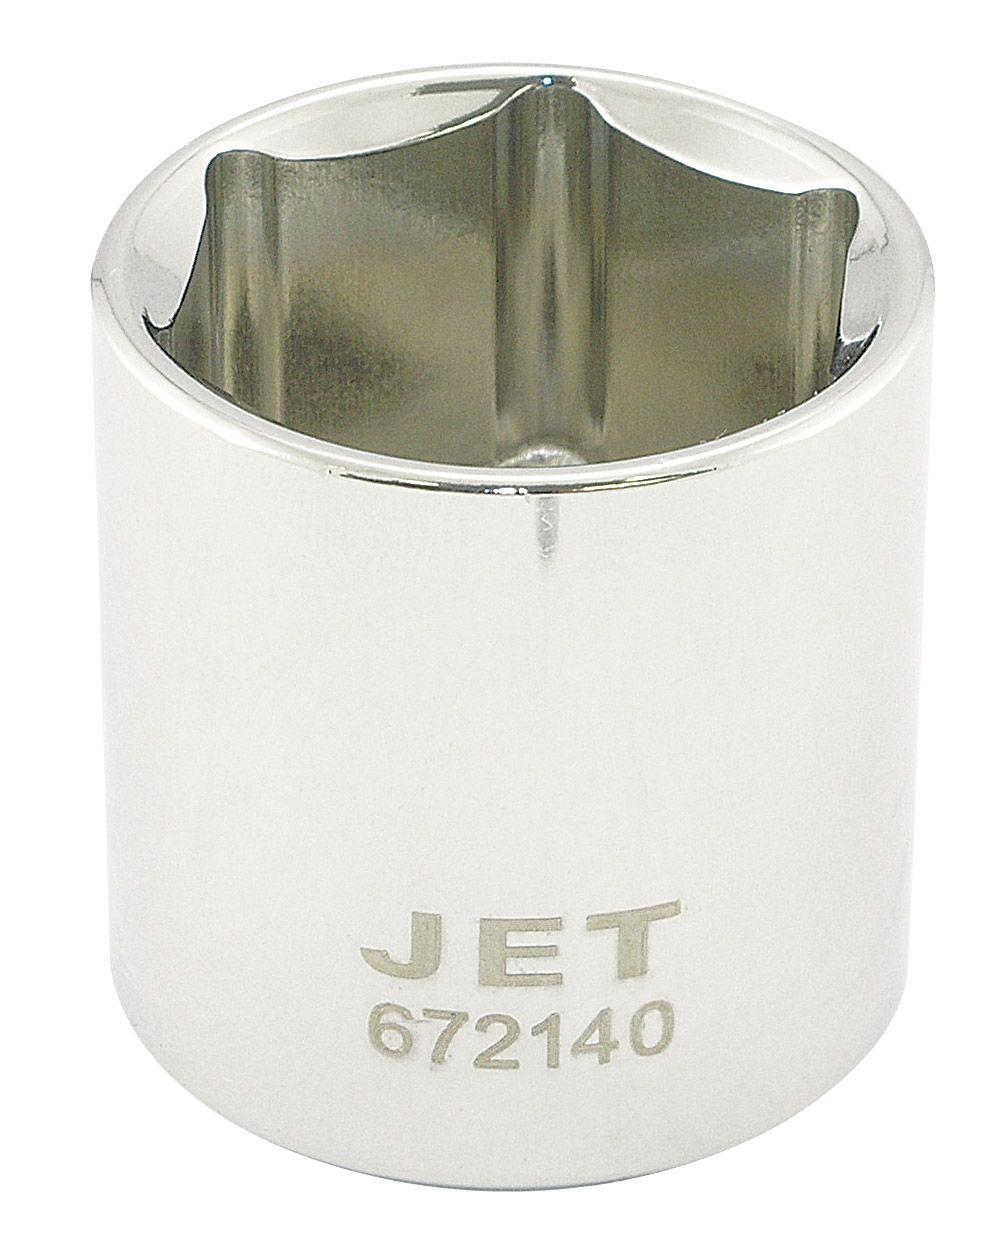 Jet 672130 Douille 15/16